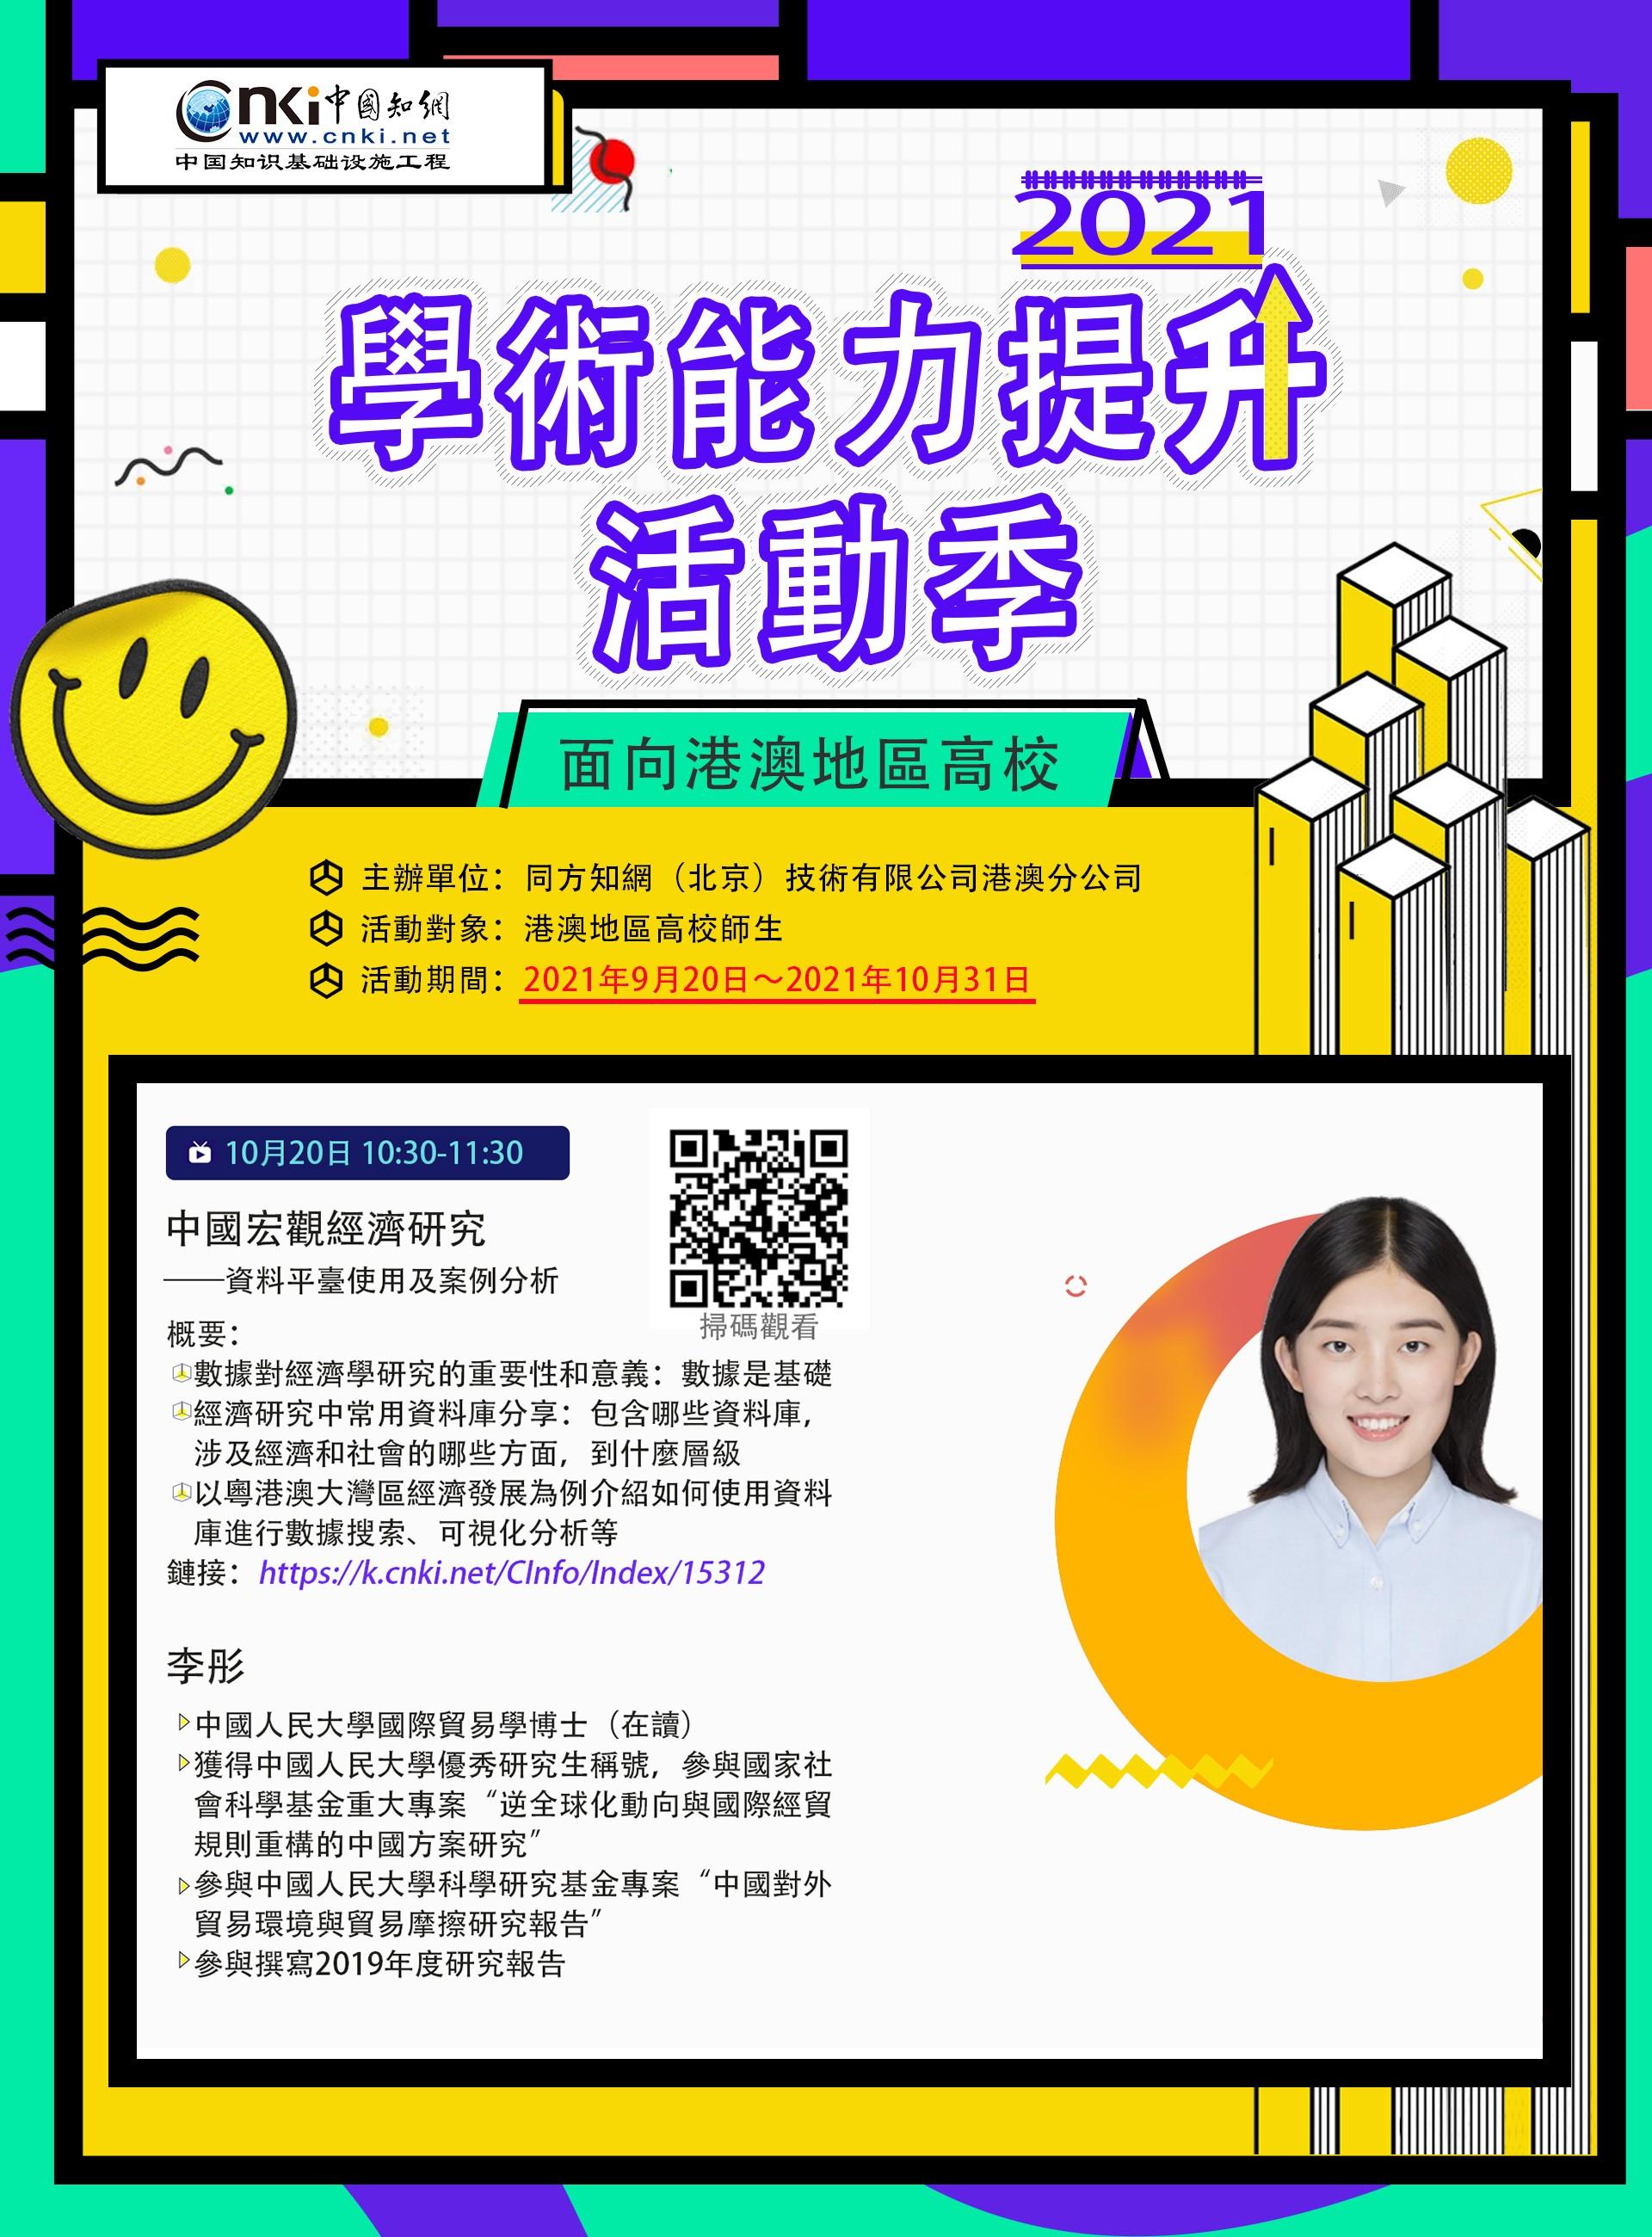 event-webinar-cnki-hkmo-20211020